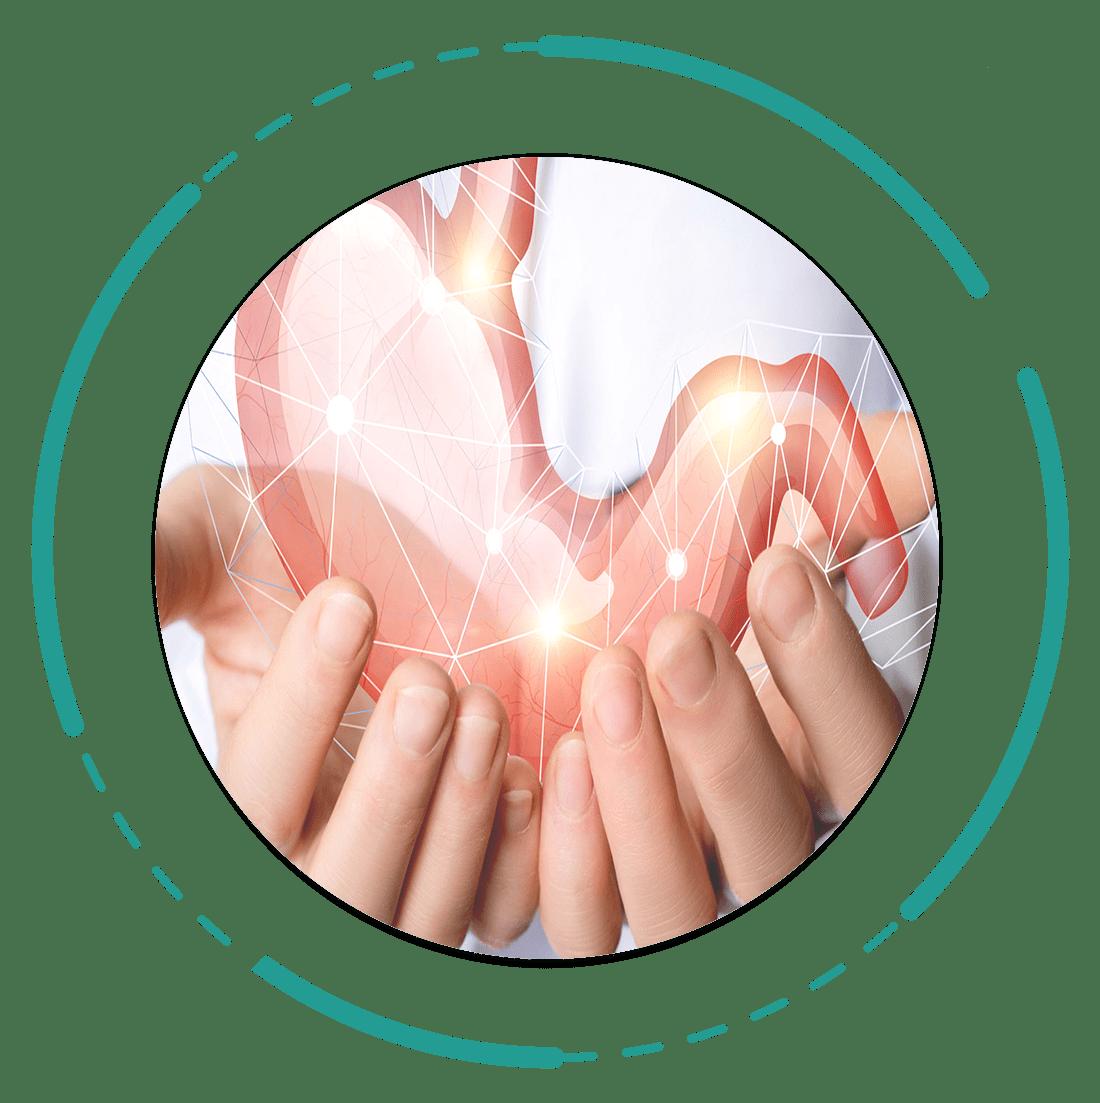 Gastroenterology